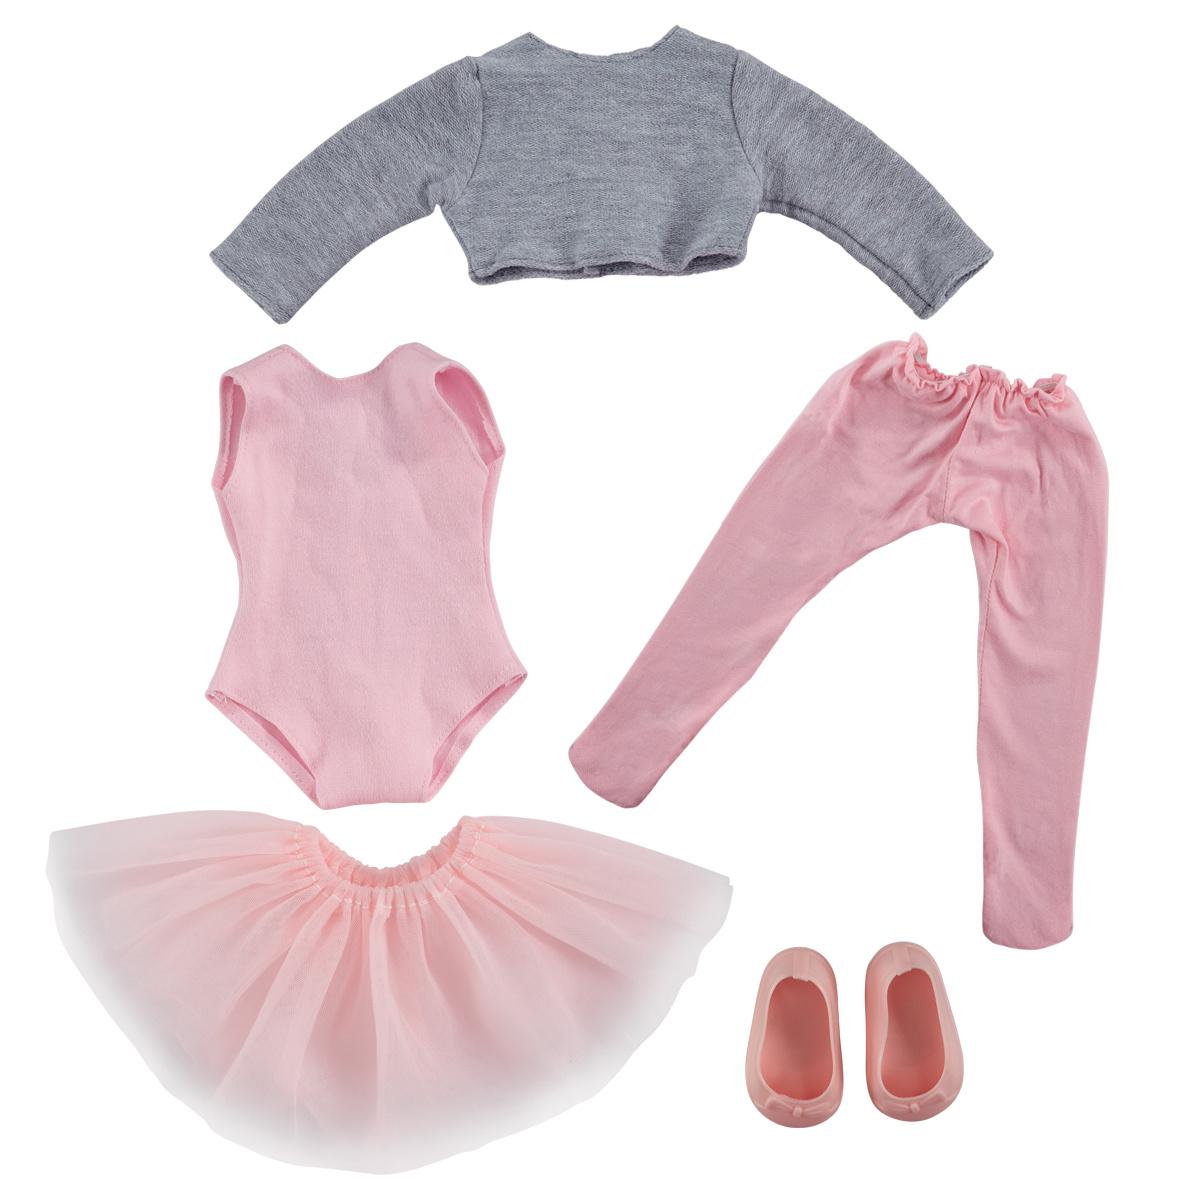 Addo B - Friends Costum Ballerina, 5 piese imagine 2021 e4home.ro